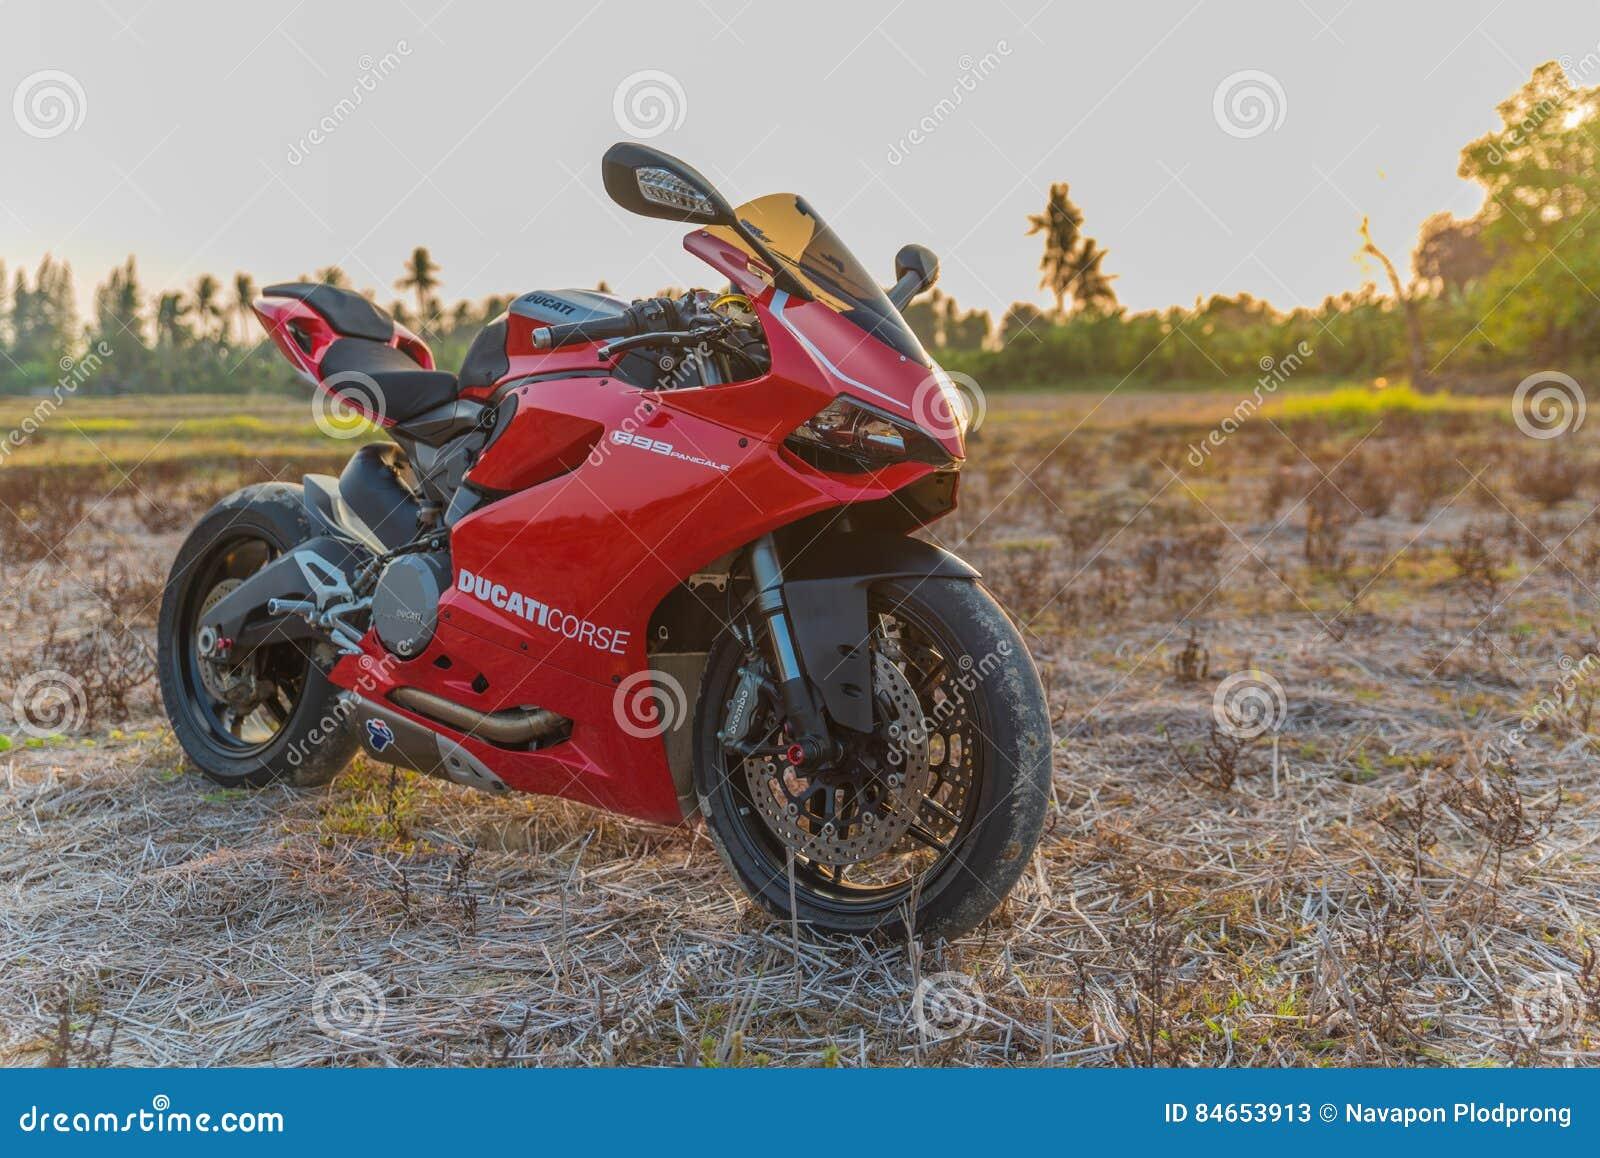 Ducati 899 Sport Bike By Ducati Motor Holding Editorial Stock Photo